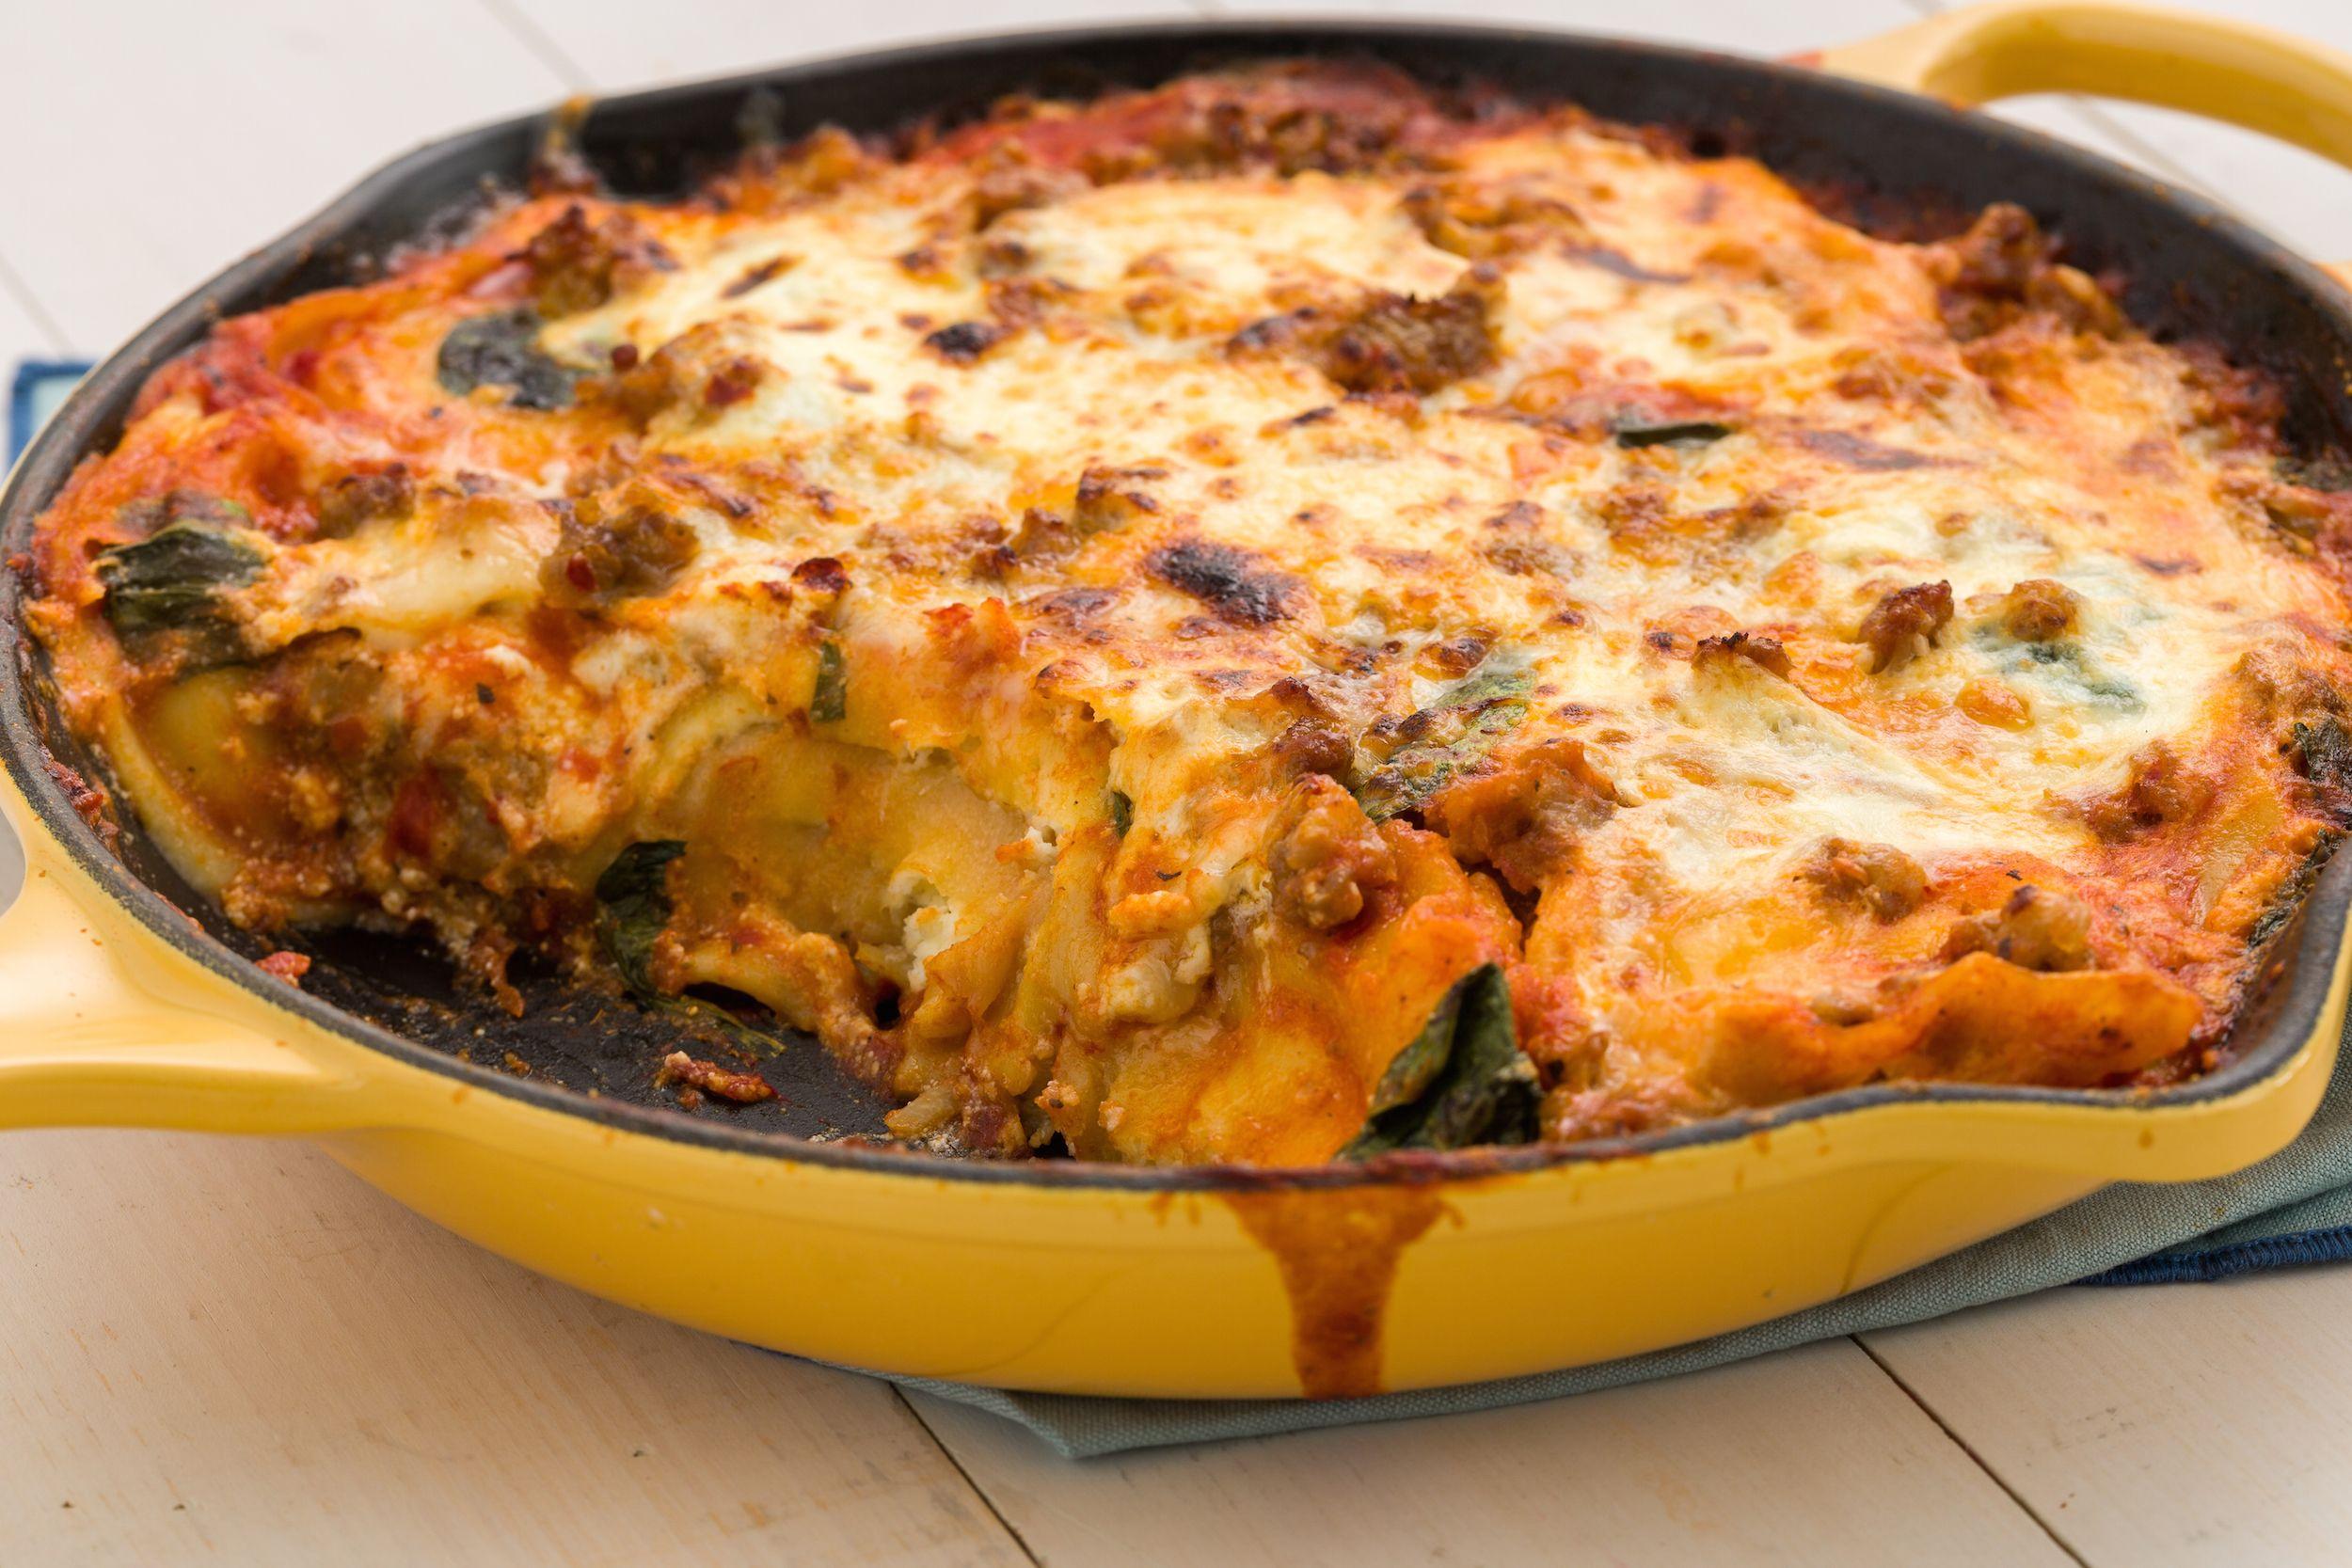 Best Skillet Ravioli Lasagna Recipe How To Make Skillet Ravioli